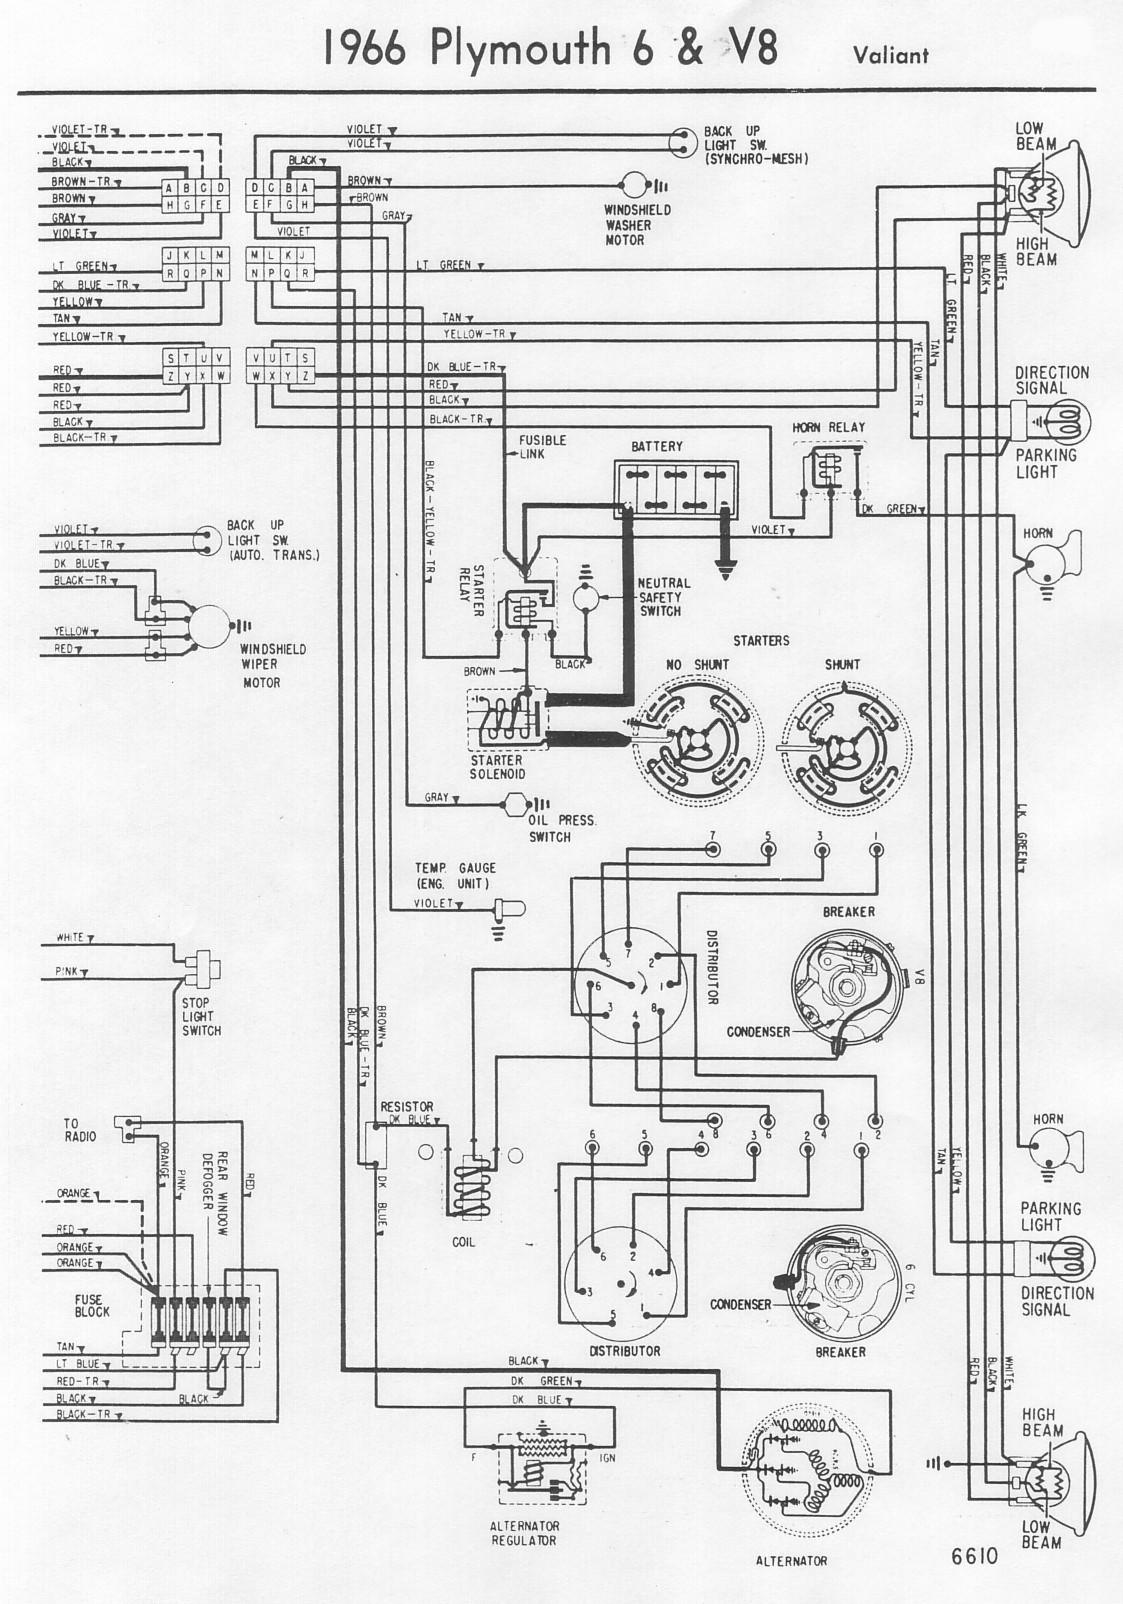 02 Honda 400ex Wiring Diagram 2004 Ignition Pretty Photos Electrical System